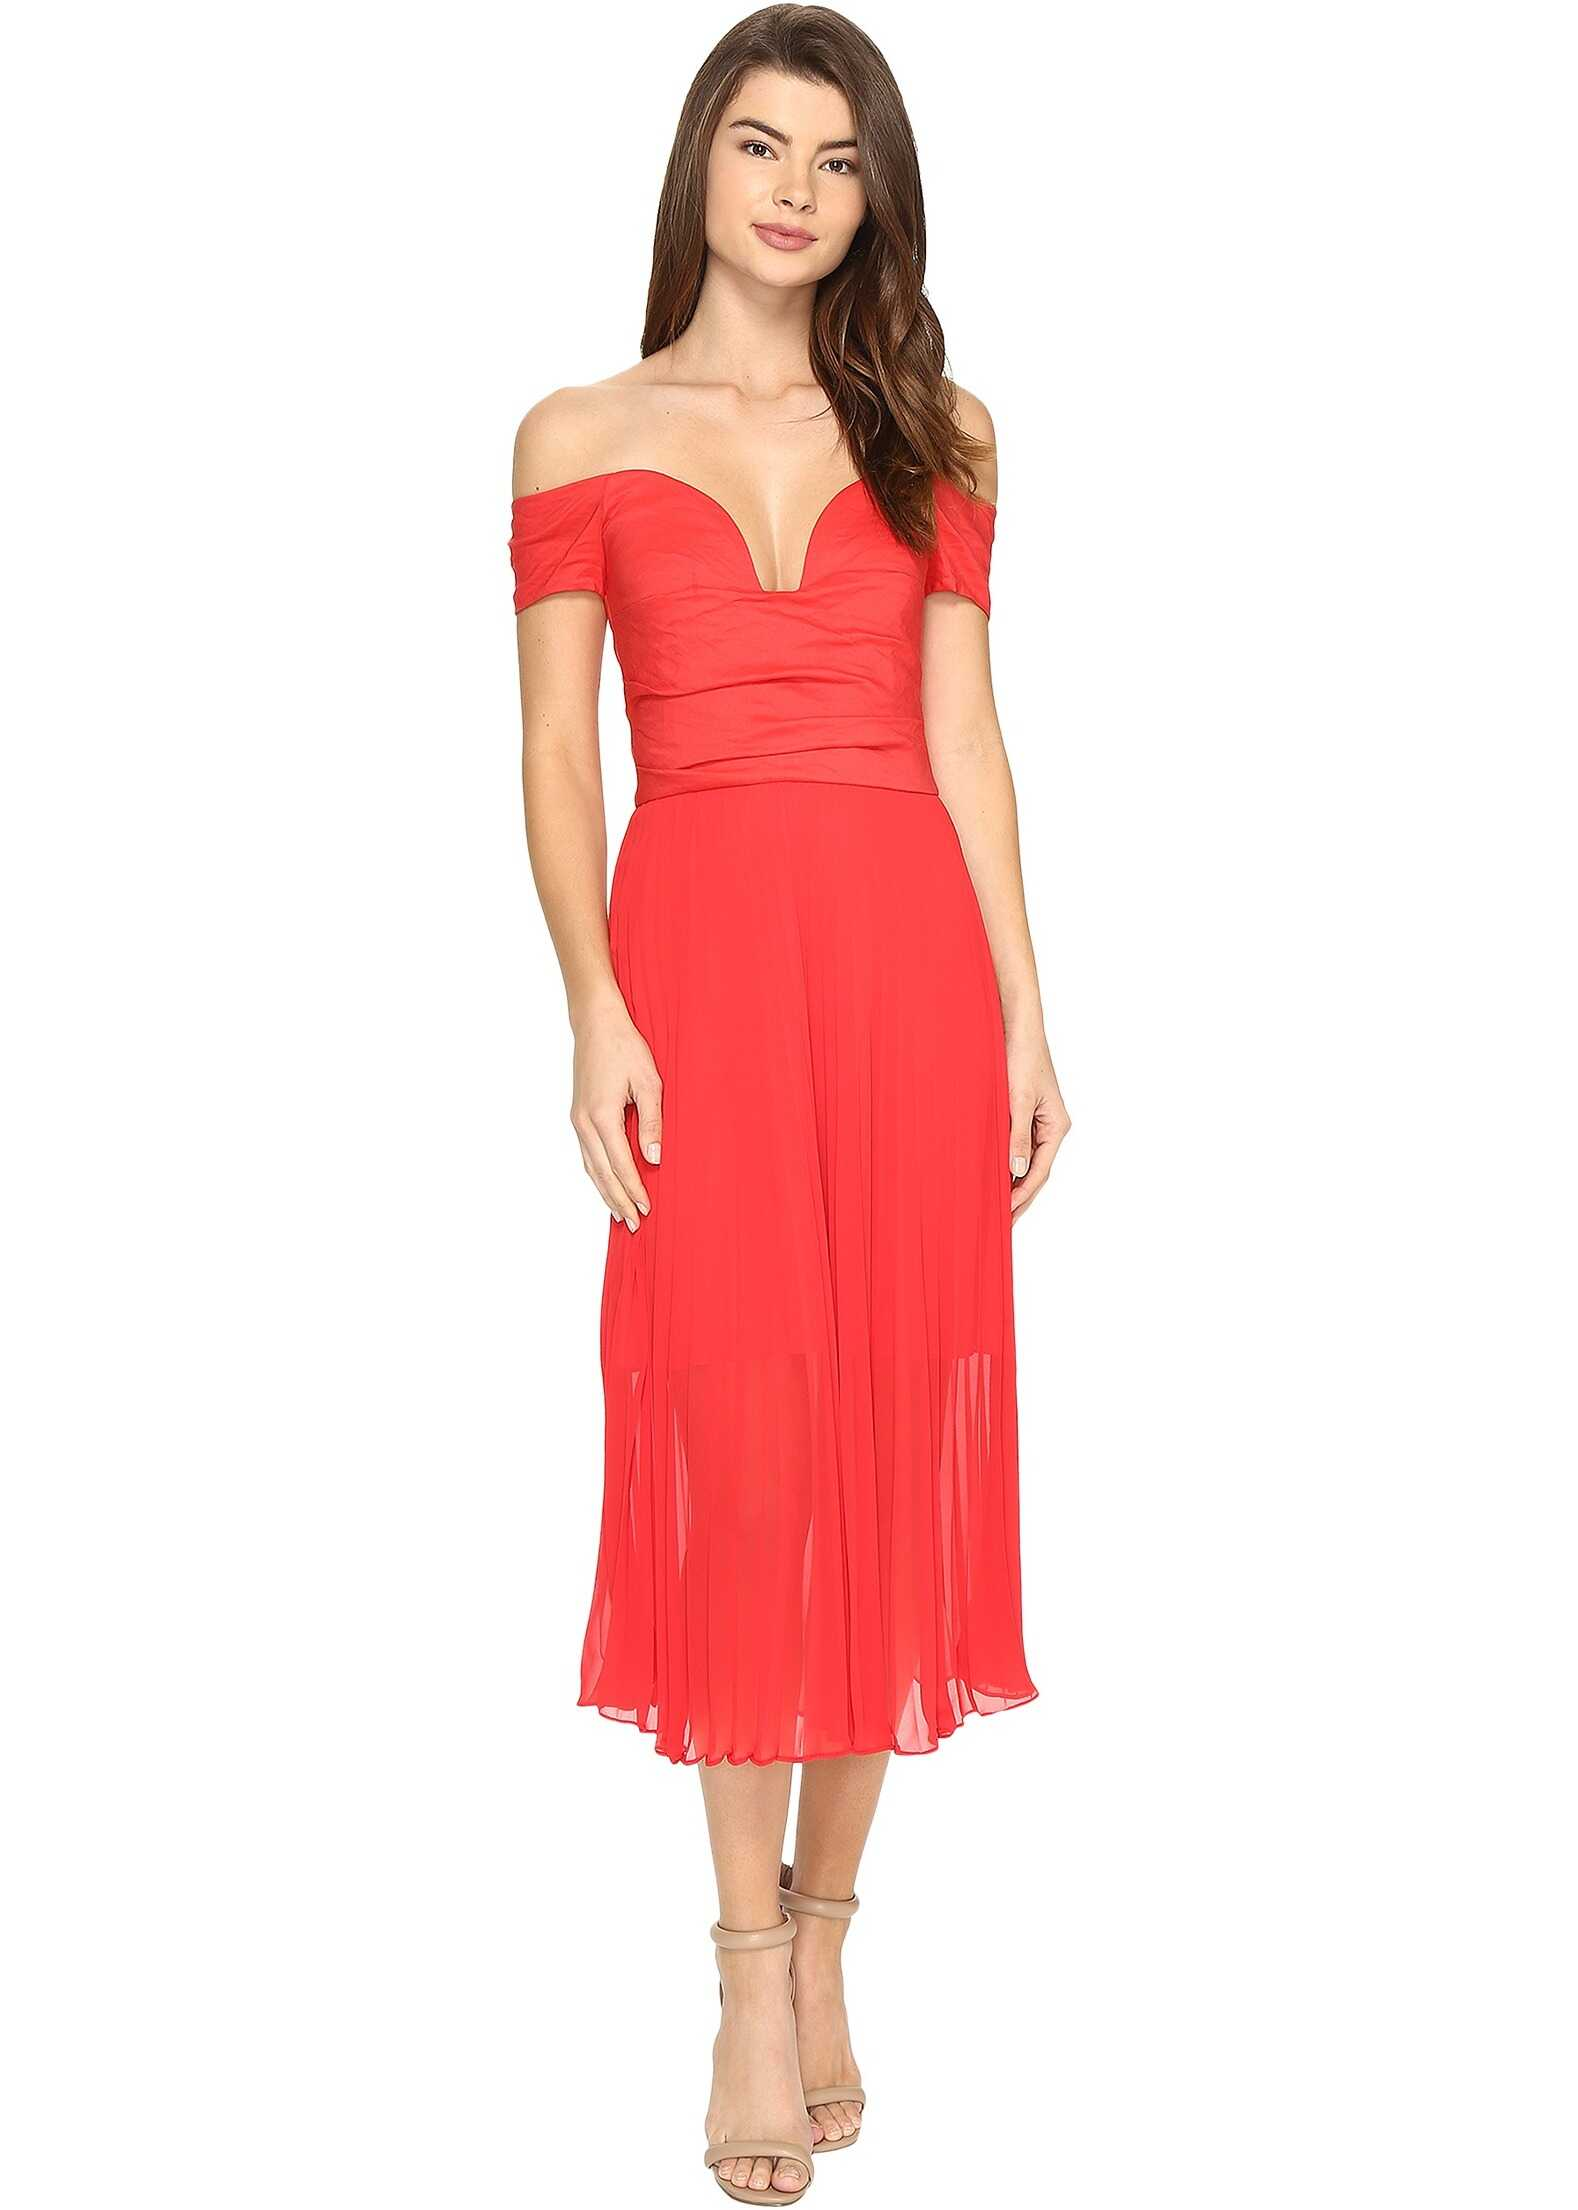 Nicole Miller Solstice Cotton Metal Combo Party Dress Watermelon